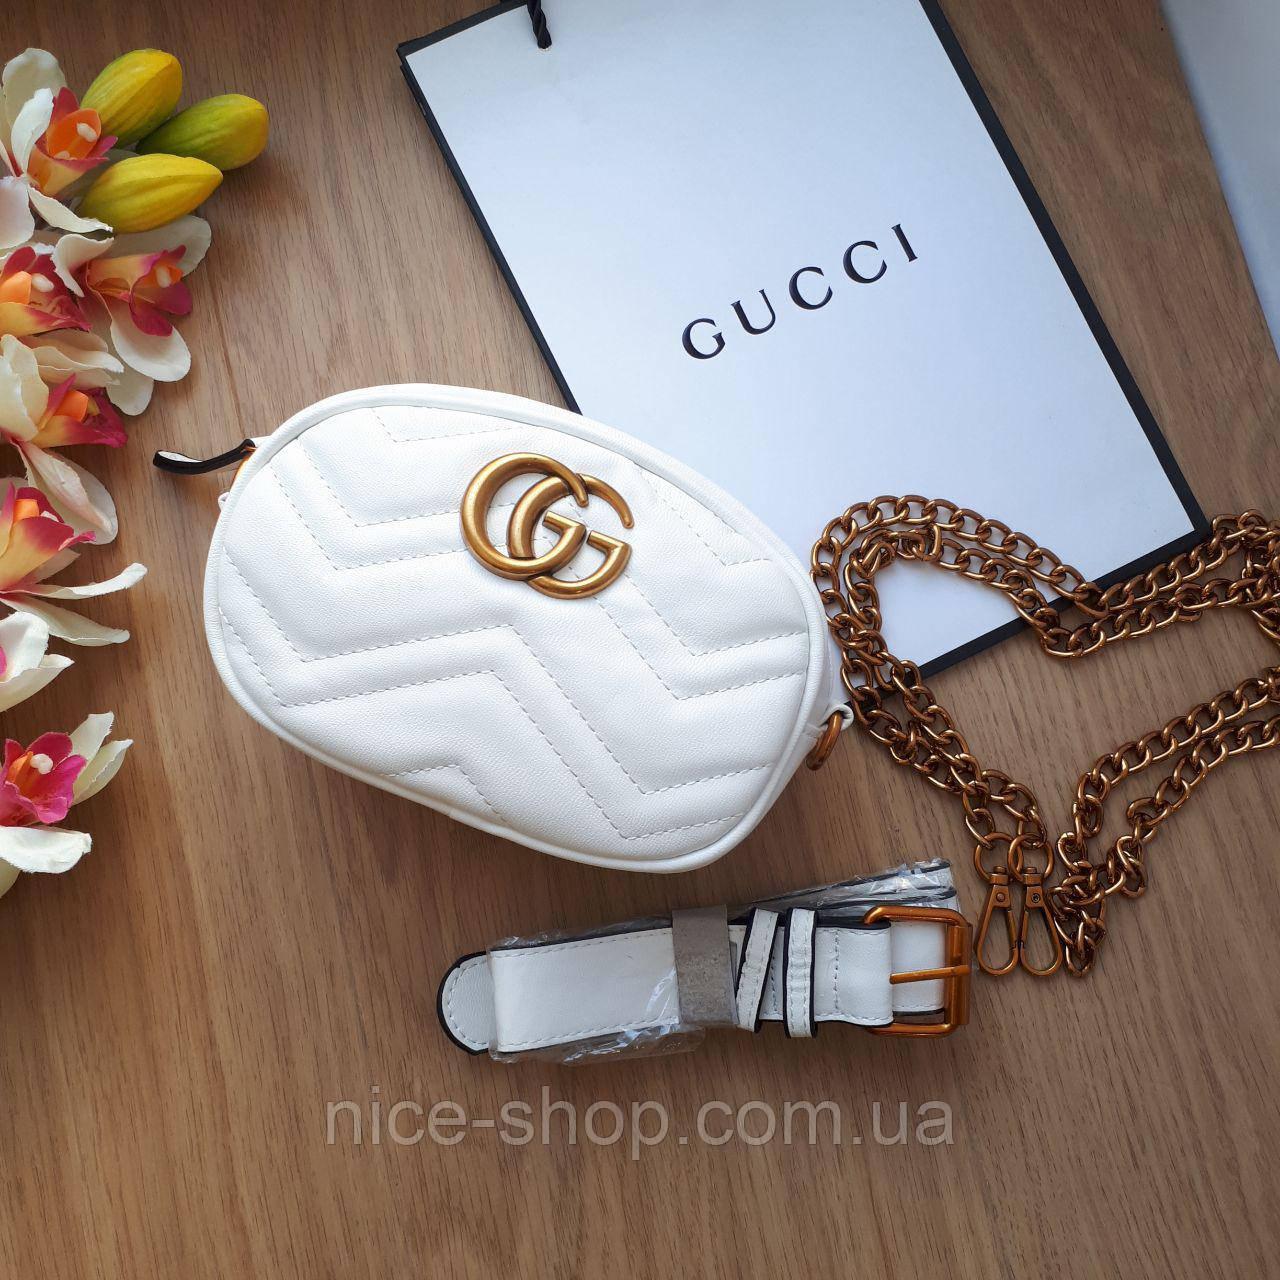 Сумочка-бананка Gucci Marmont белая, эко-кожа